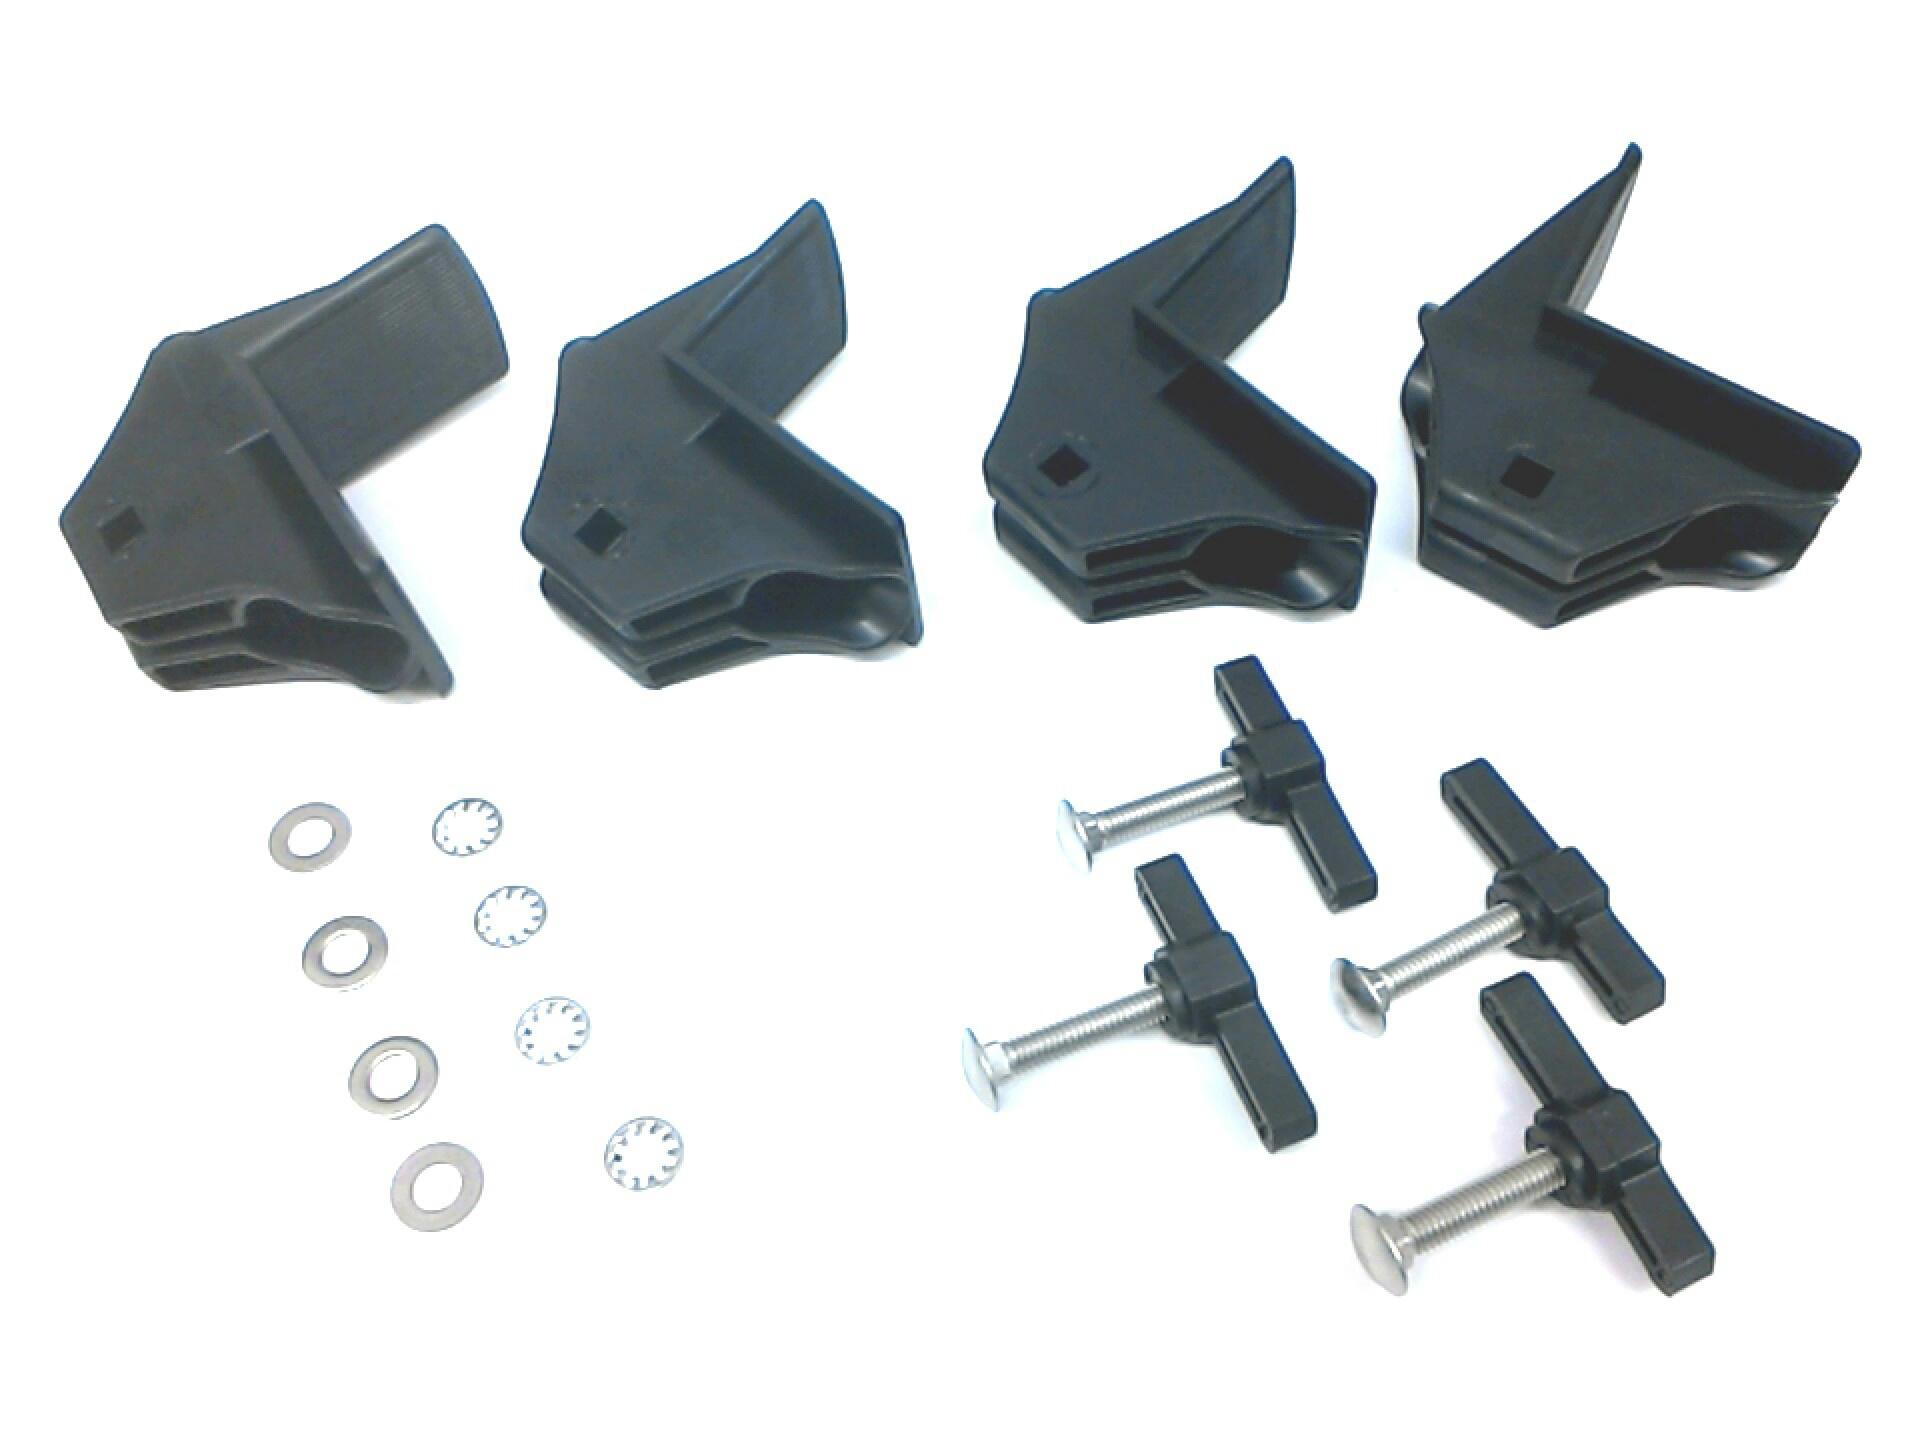 E3610AS450 - Subaru Stabilizing Brackets (4) - Round Cross Bars. Lifestyle, Exterior | West ...